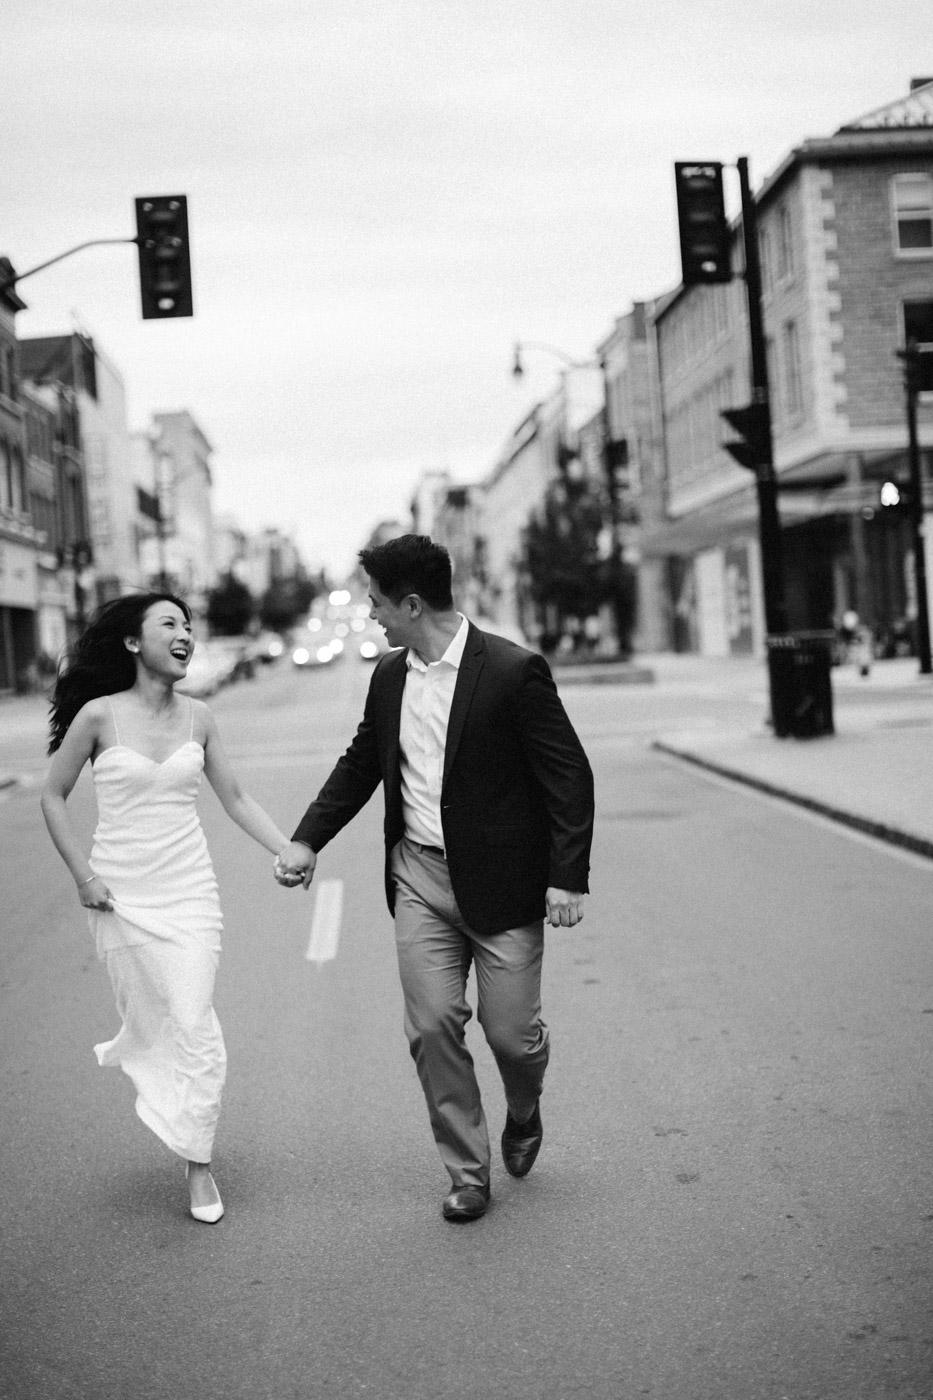 toronto_wedding_photographer_engagement_photography_tips-46.jpg